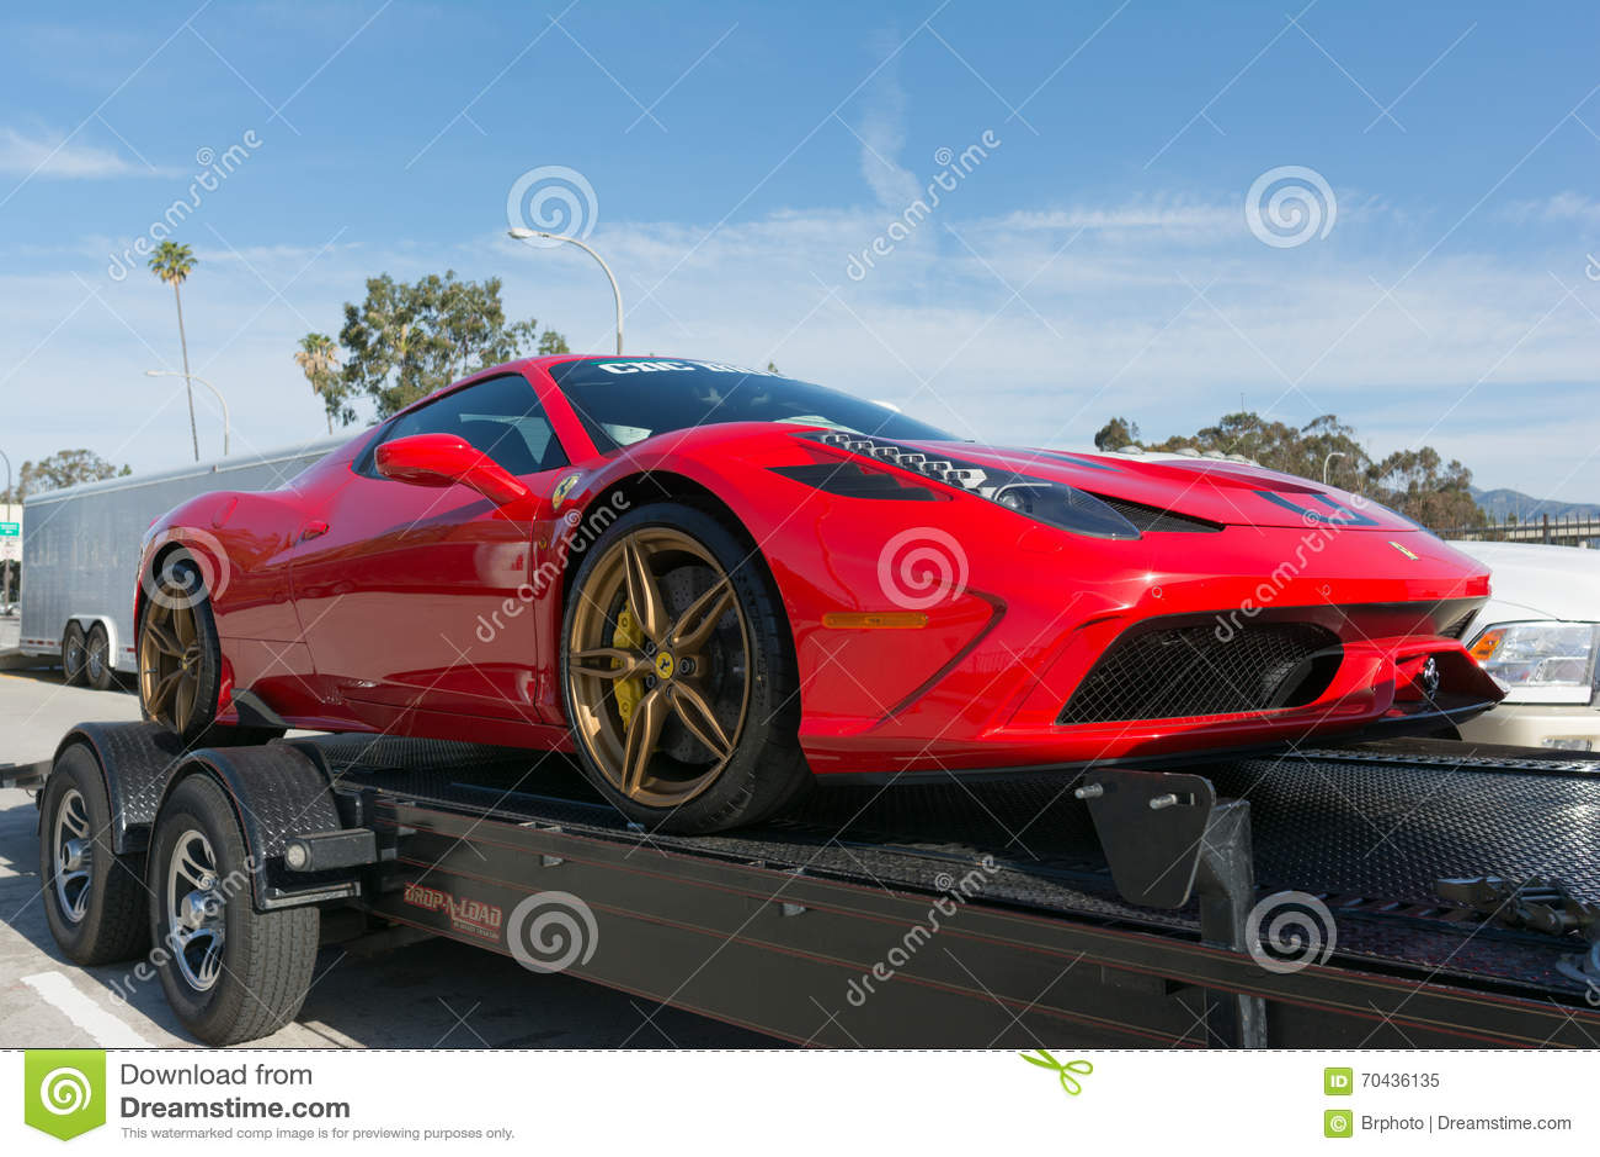 Ferrari 458 Car On Display Editorial Image Image Of Motor 70436135